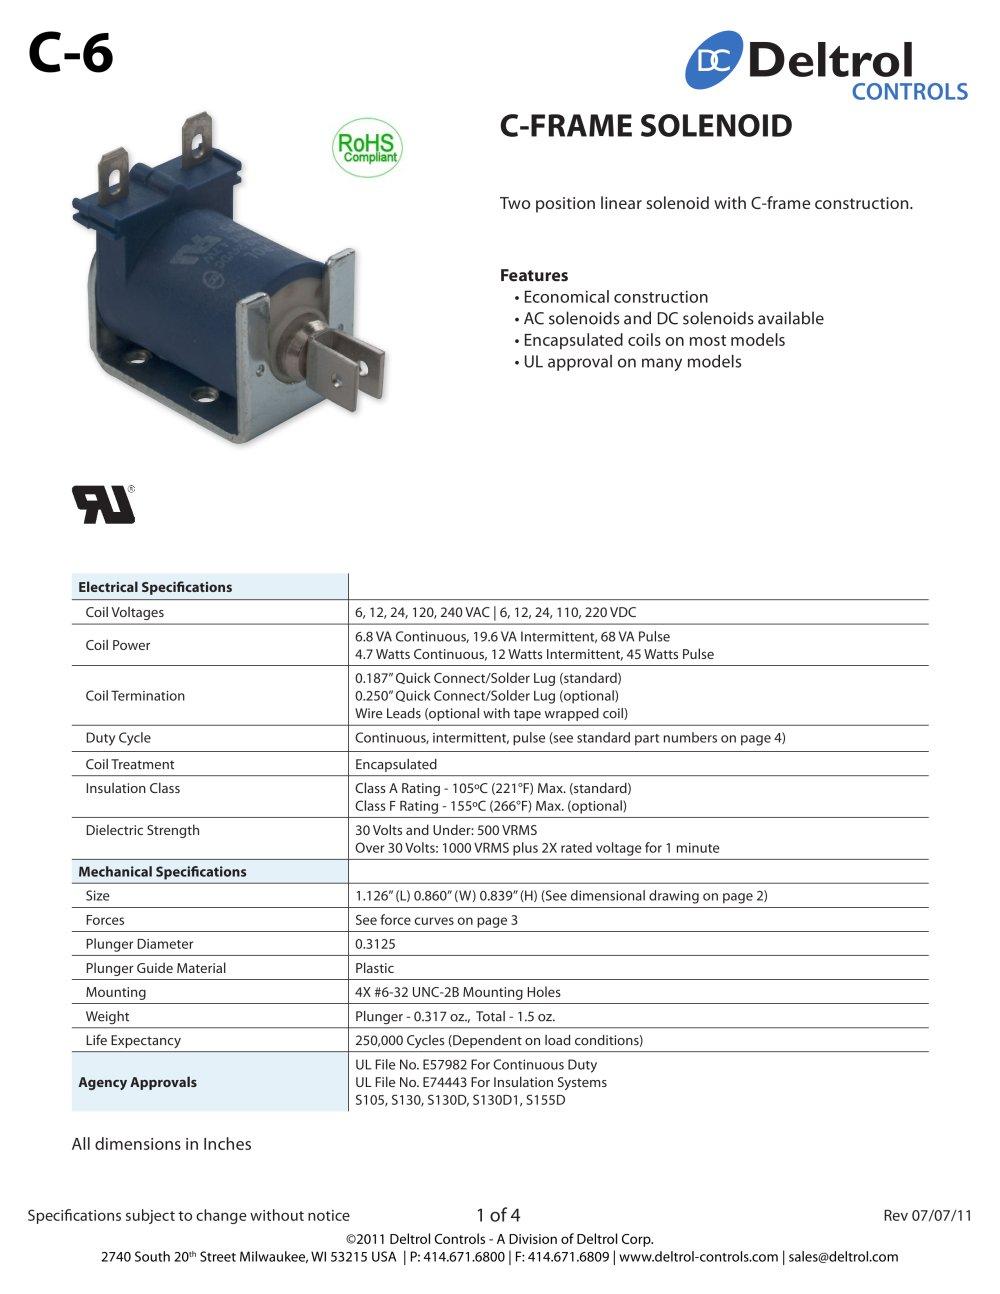 C 6 Frame Solenoid Deltrol Controls Pdf Catalogue Technical 12 Volt Wiring Diagram 5 Connection 1 4 Pages